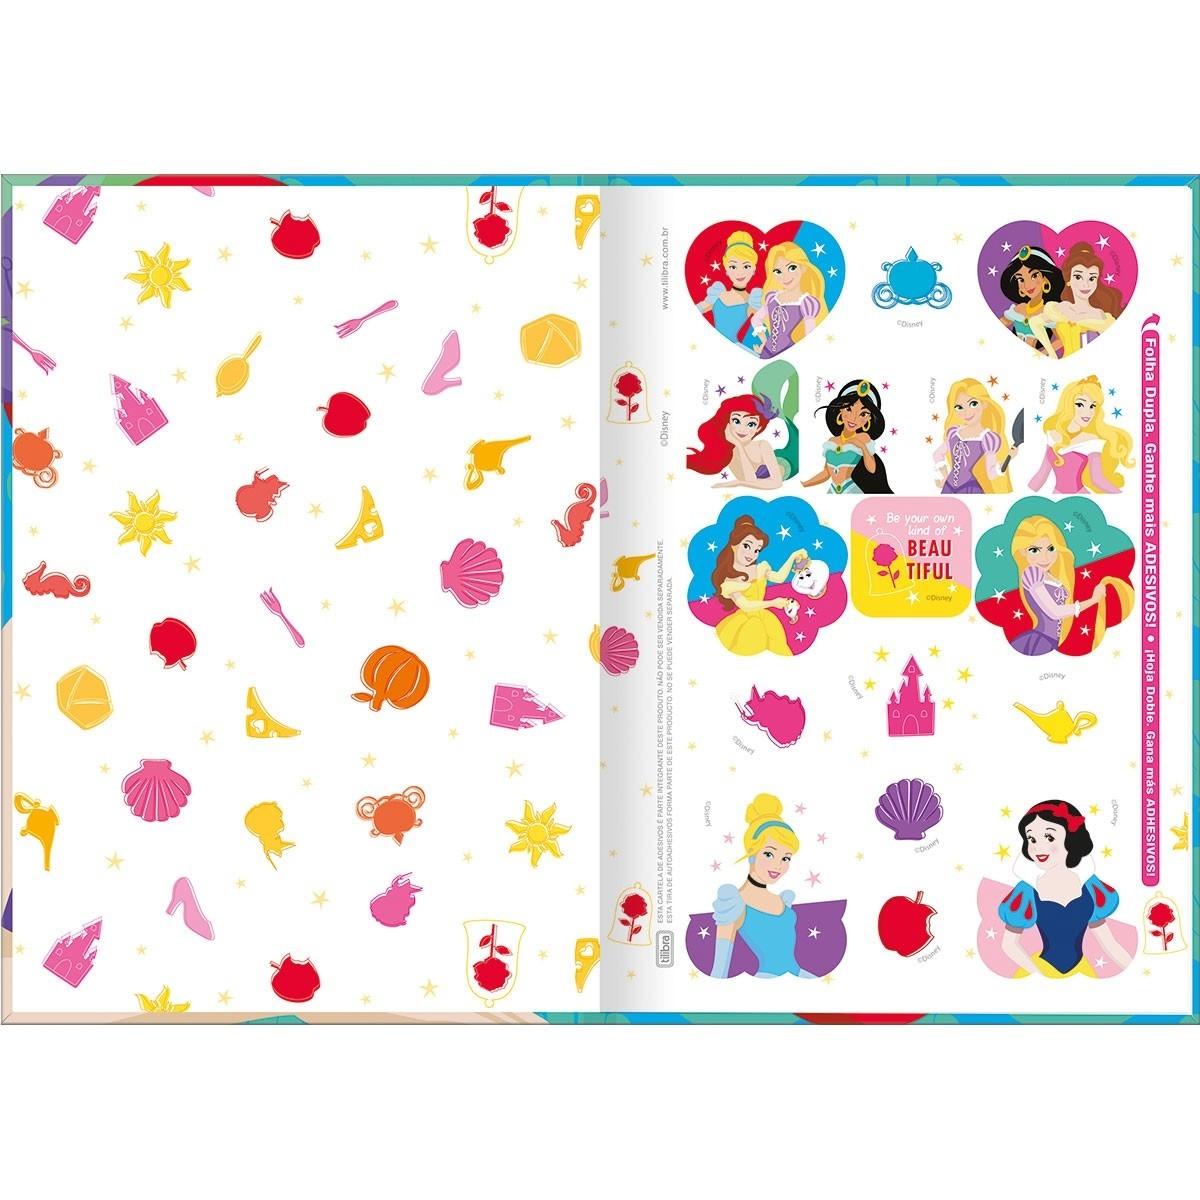 Caderno Brochura Capa Dura 1/4 Princesas 80 Fls Tilibra